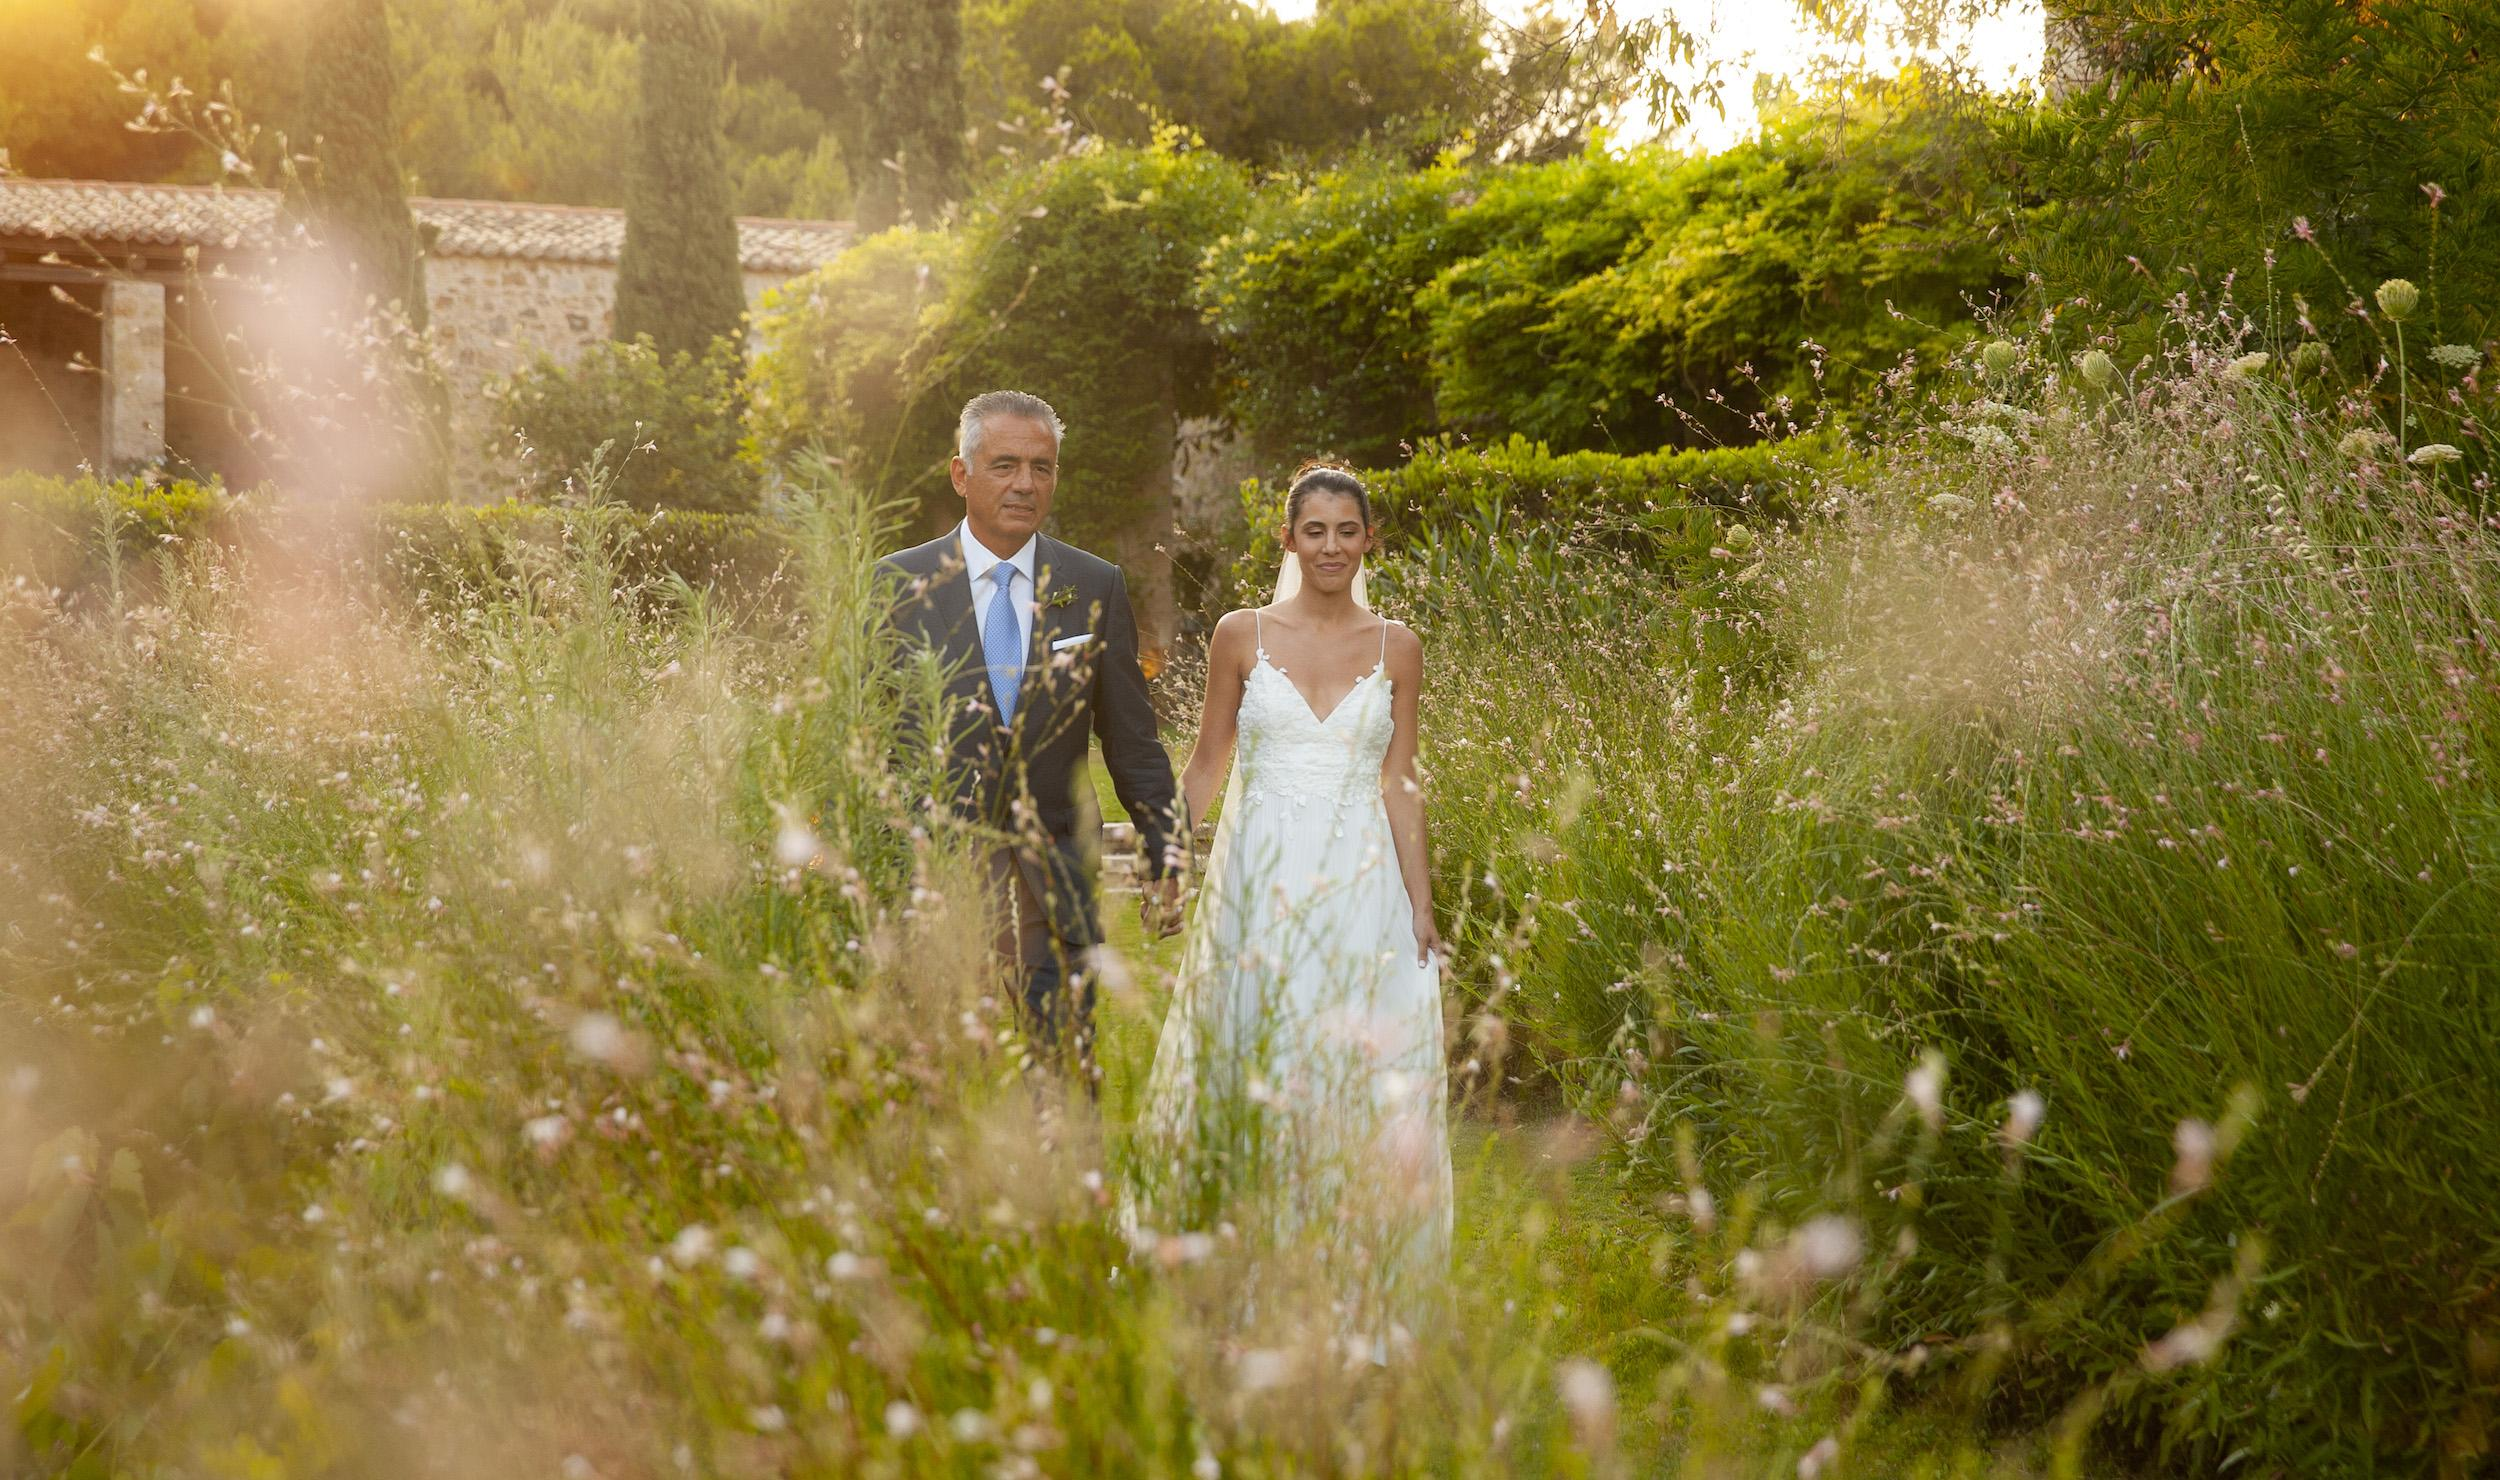 I&M Sinterina wedding - Image 9